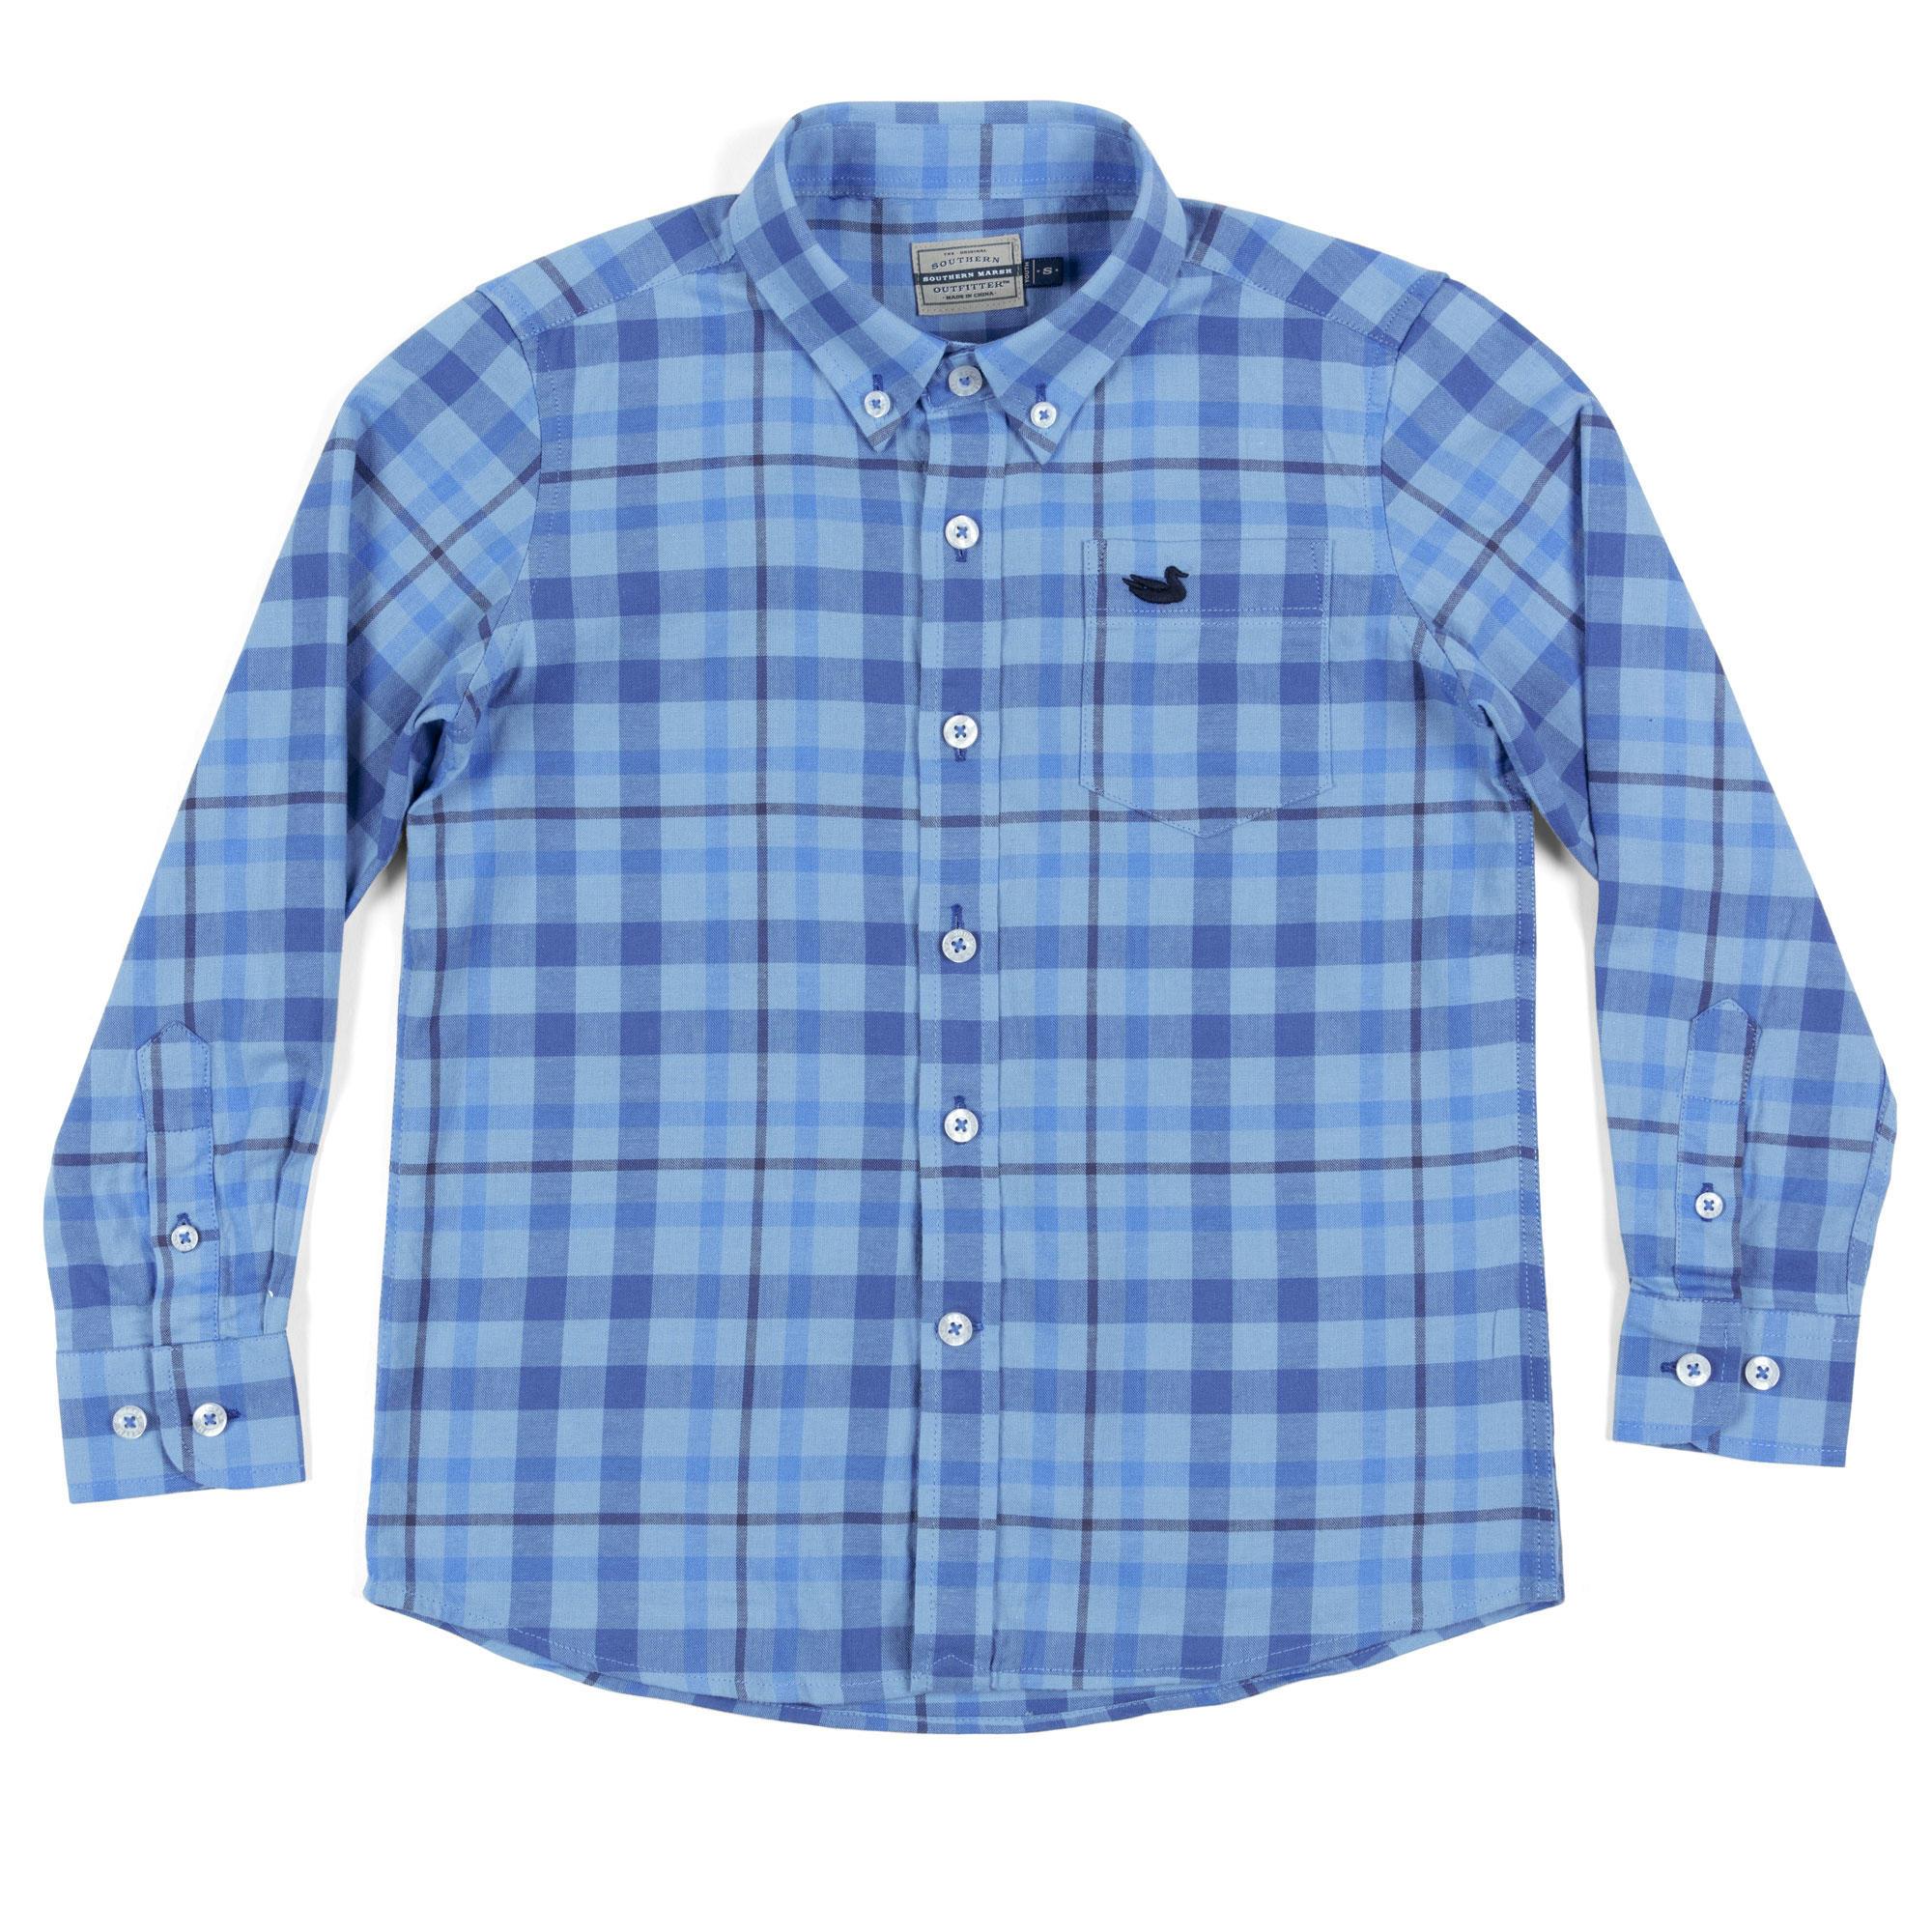 Southern Marsh Youth Boundary Washed Plaid Shirt